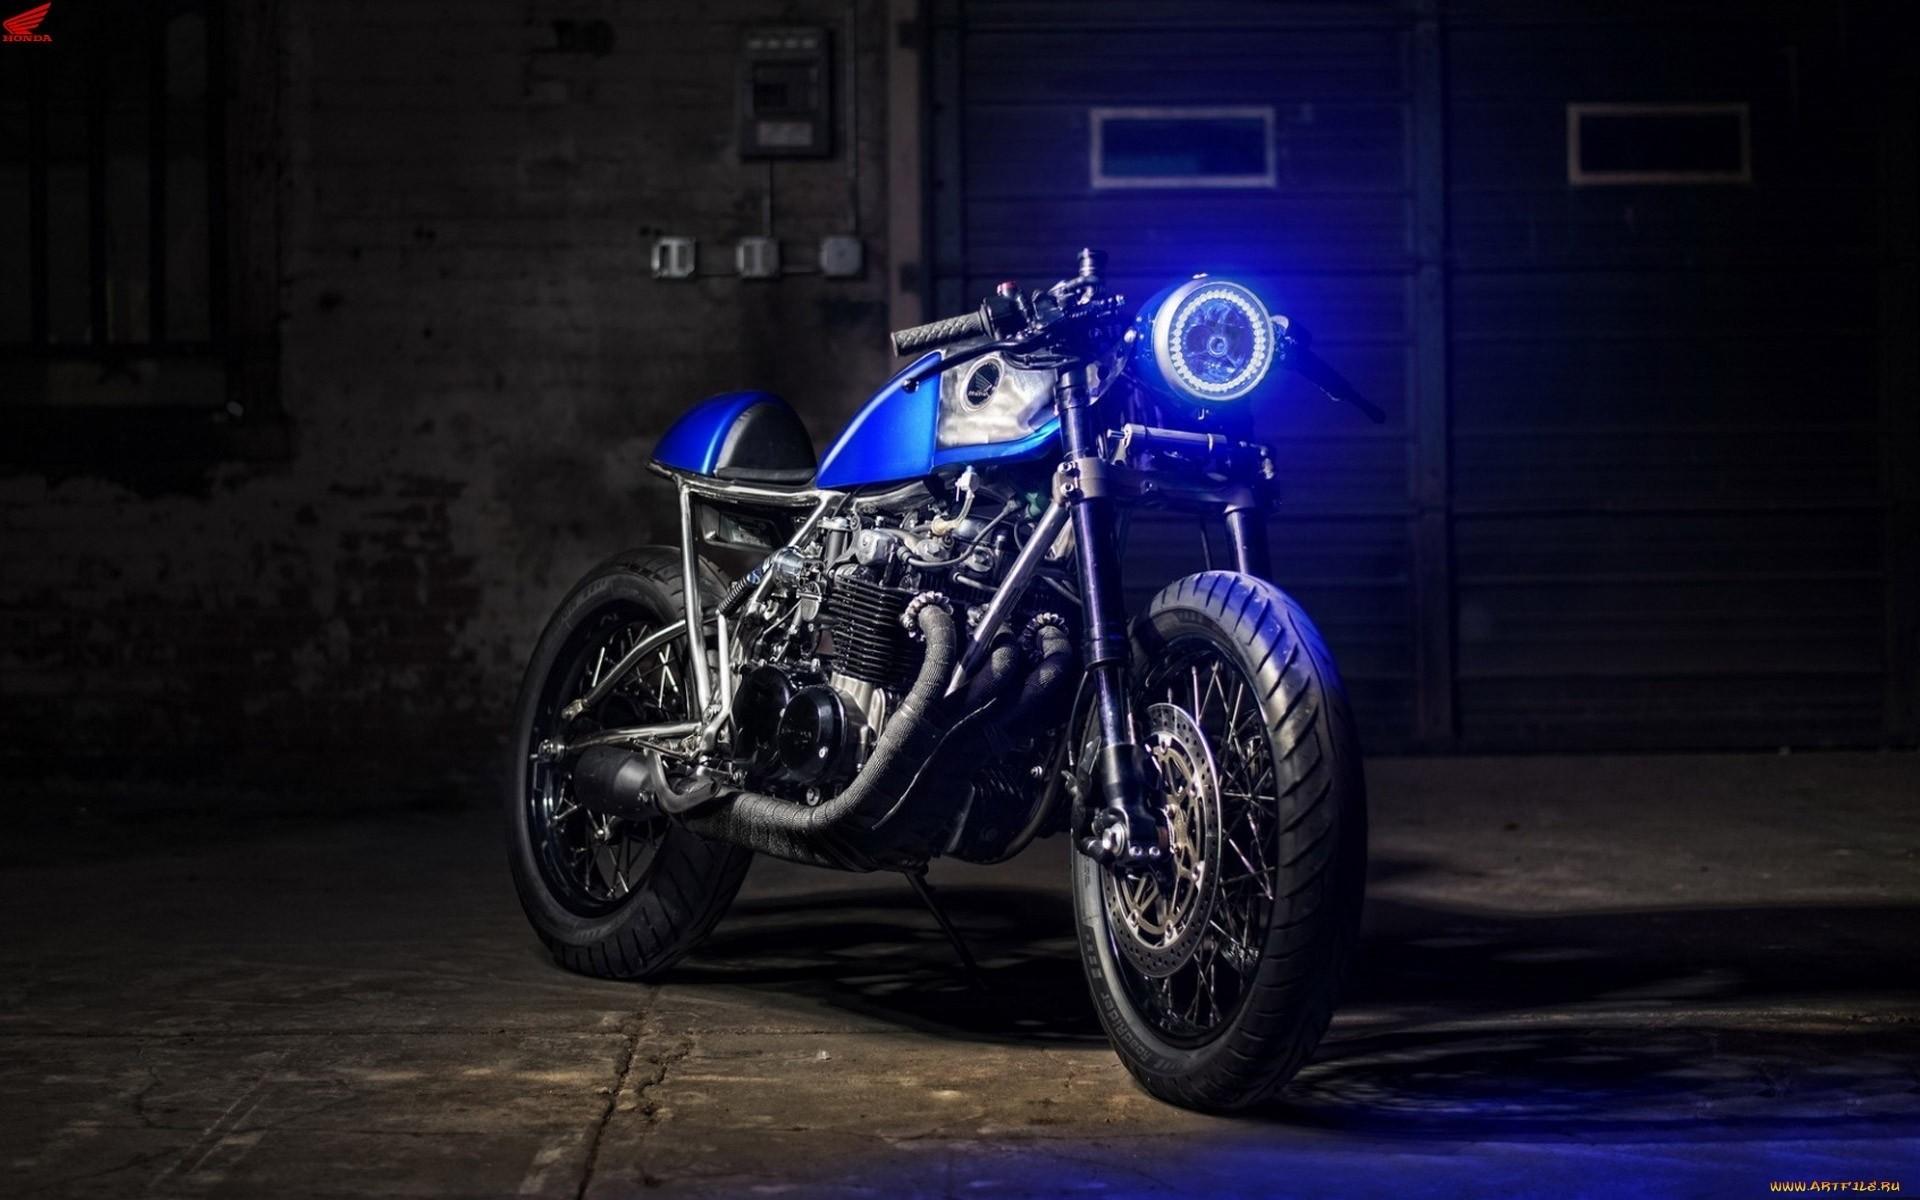 classic honda cafe racer custom, motorcycles, customs, style, cafe racer,  classic, Honda, tuning, customizing